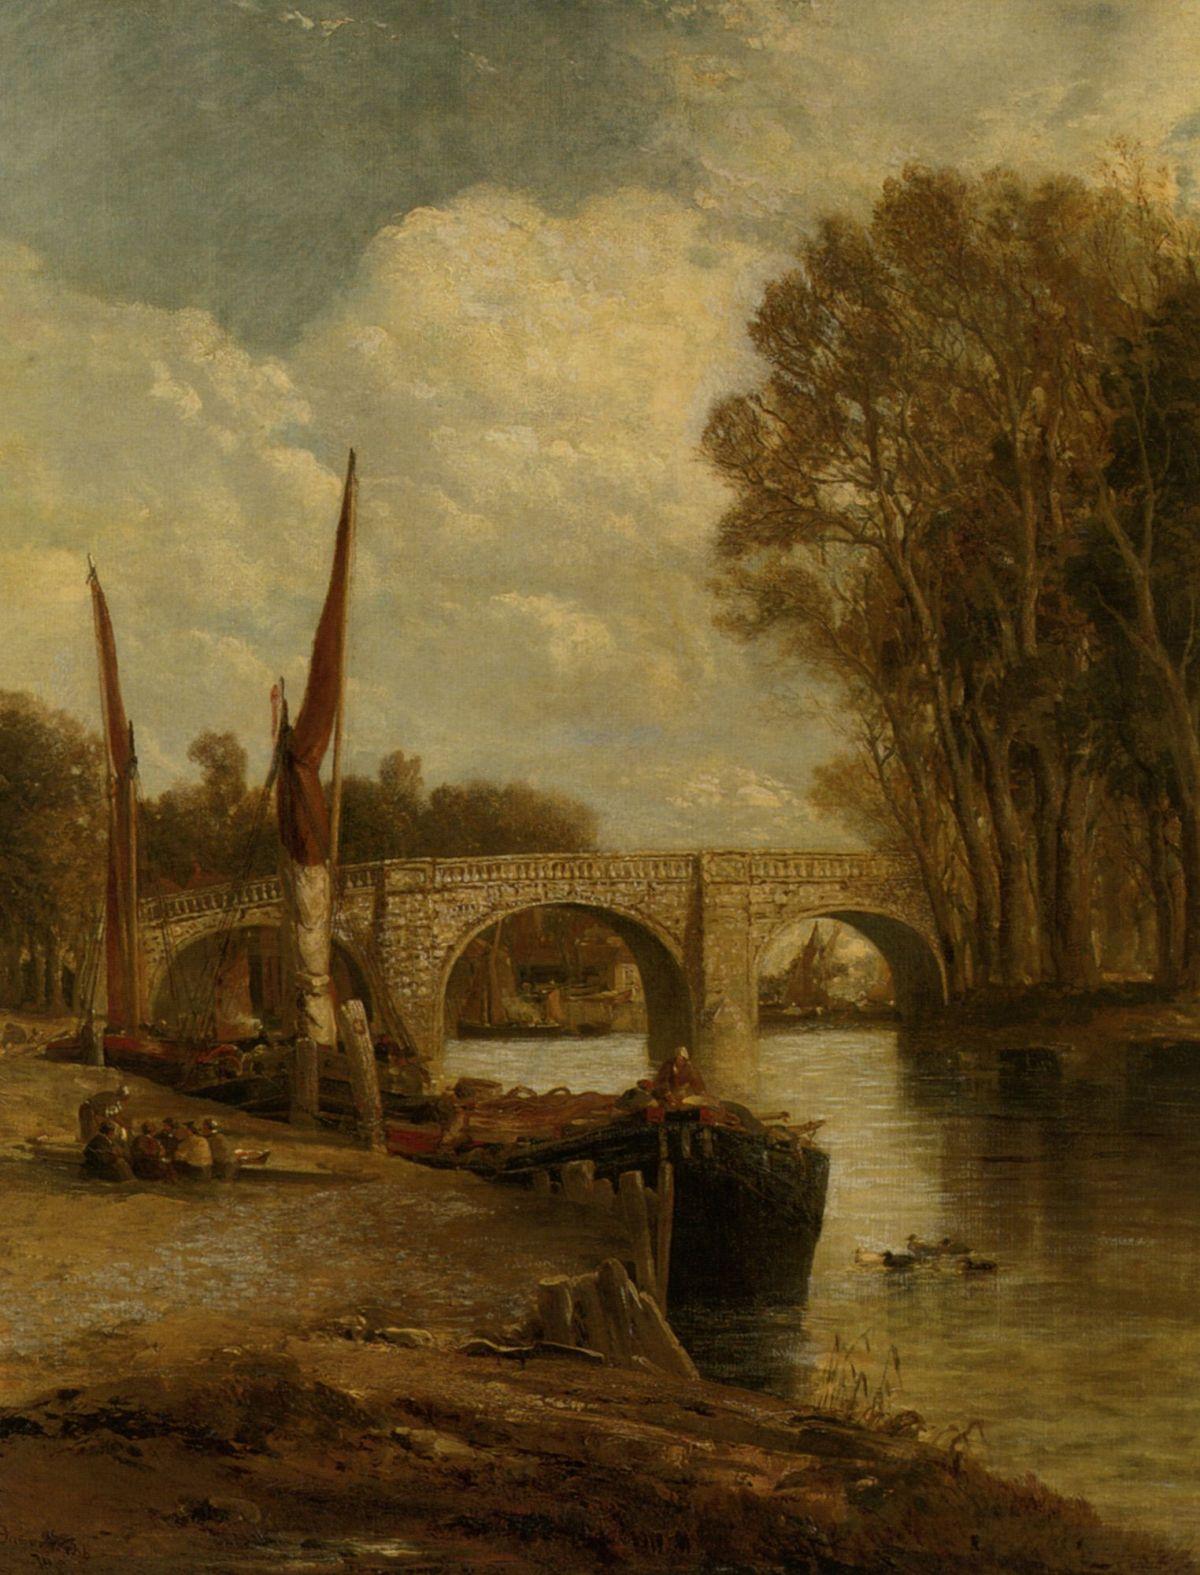 Kew Bridge by James Webb